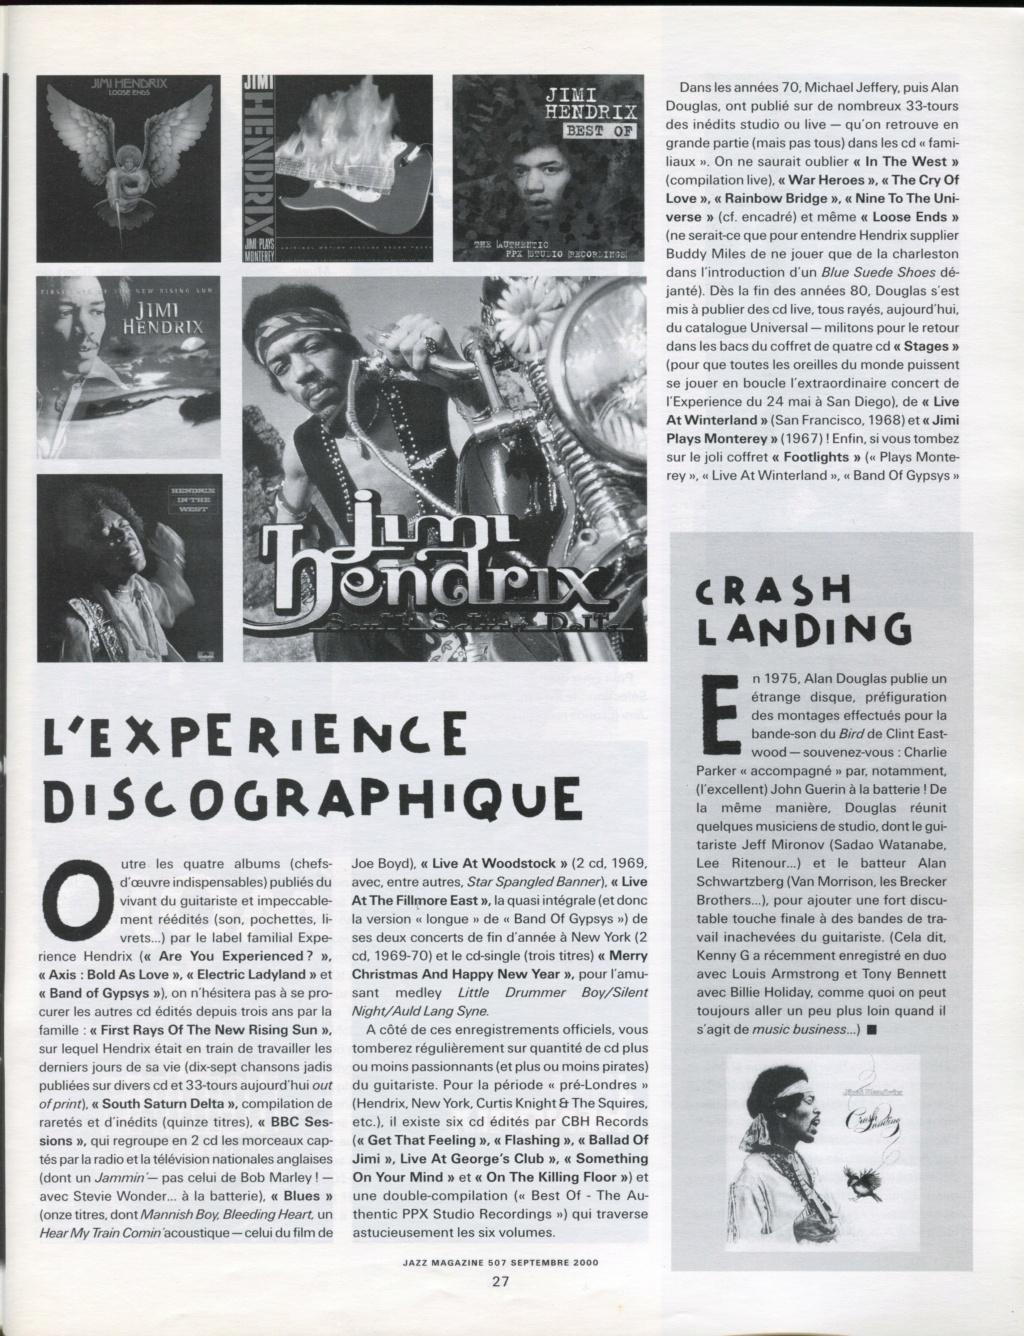 Magazines Français 1989 - 2014 - Page 2 1990_142